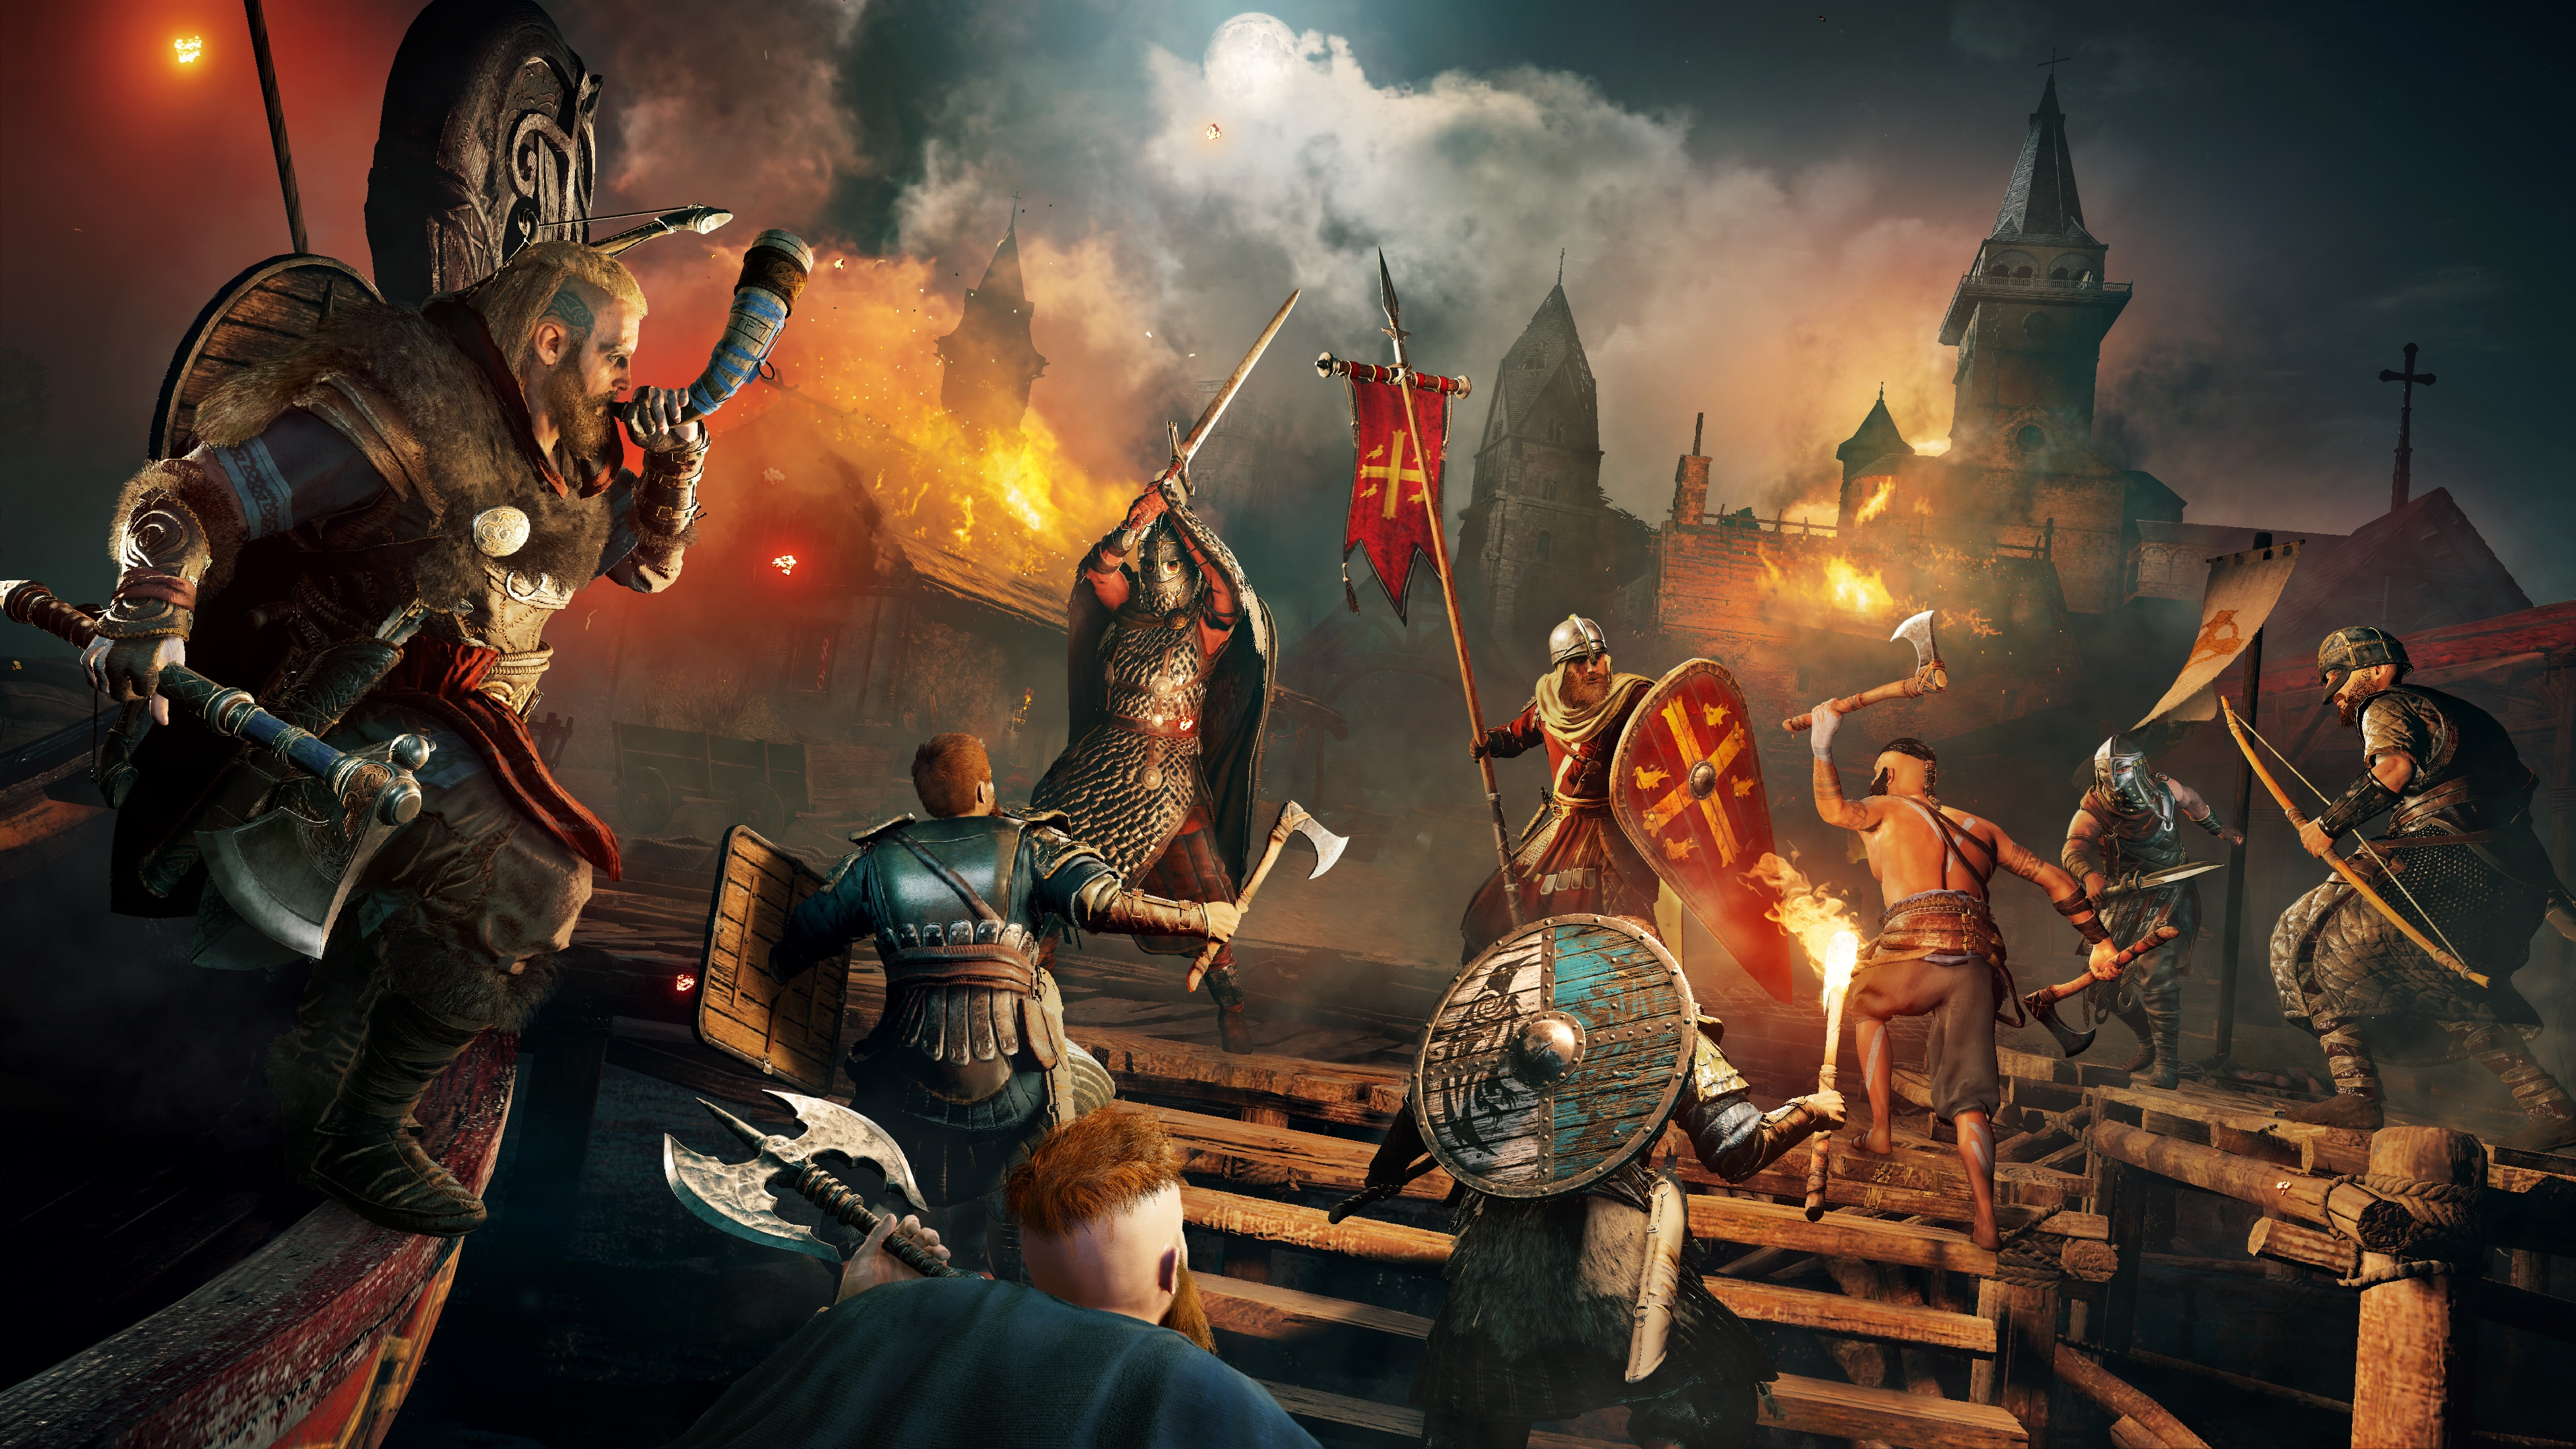 Assassin's Creed Valhalla - Digital Standard Edition PS4 & PS5 (English/Chinese/Korean/Japanese Ver.)